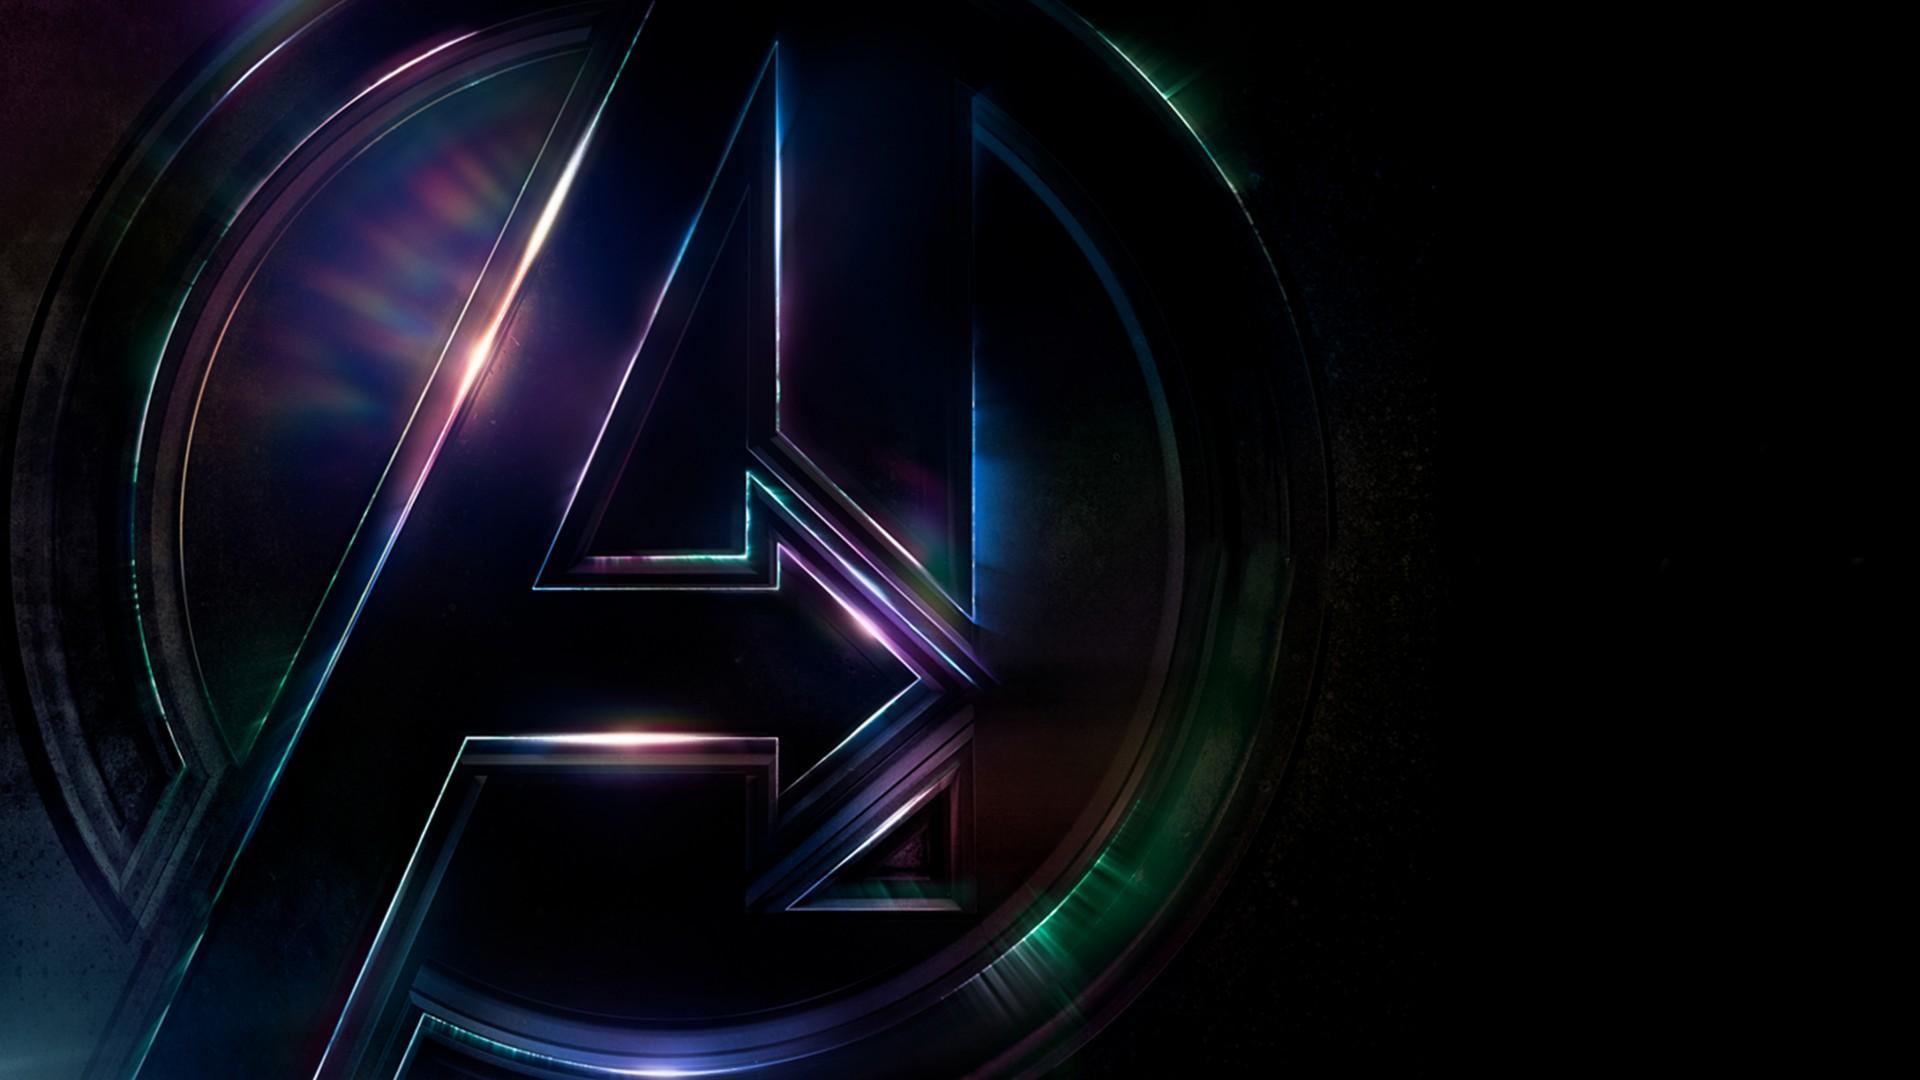 Cute 3d Wallpapers For Laptops Avengers Infinity War Logo 4k Wallpapers Hd Wallpapers